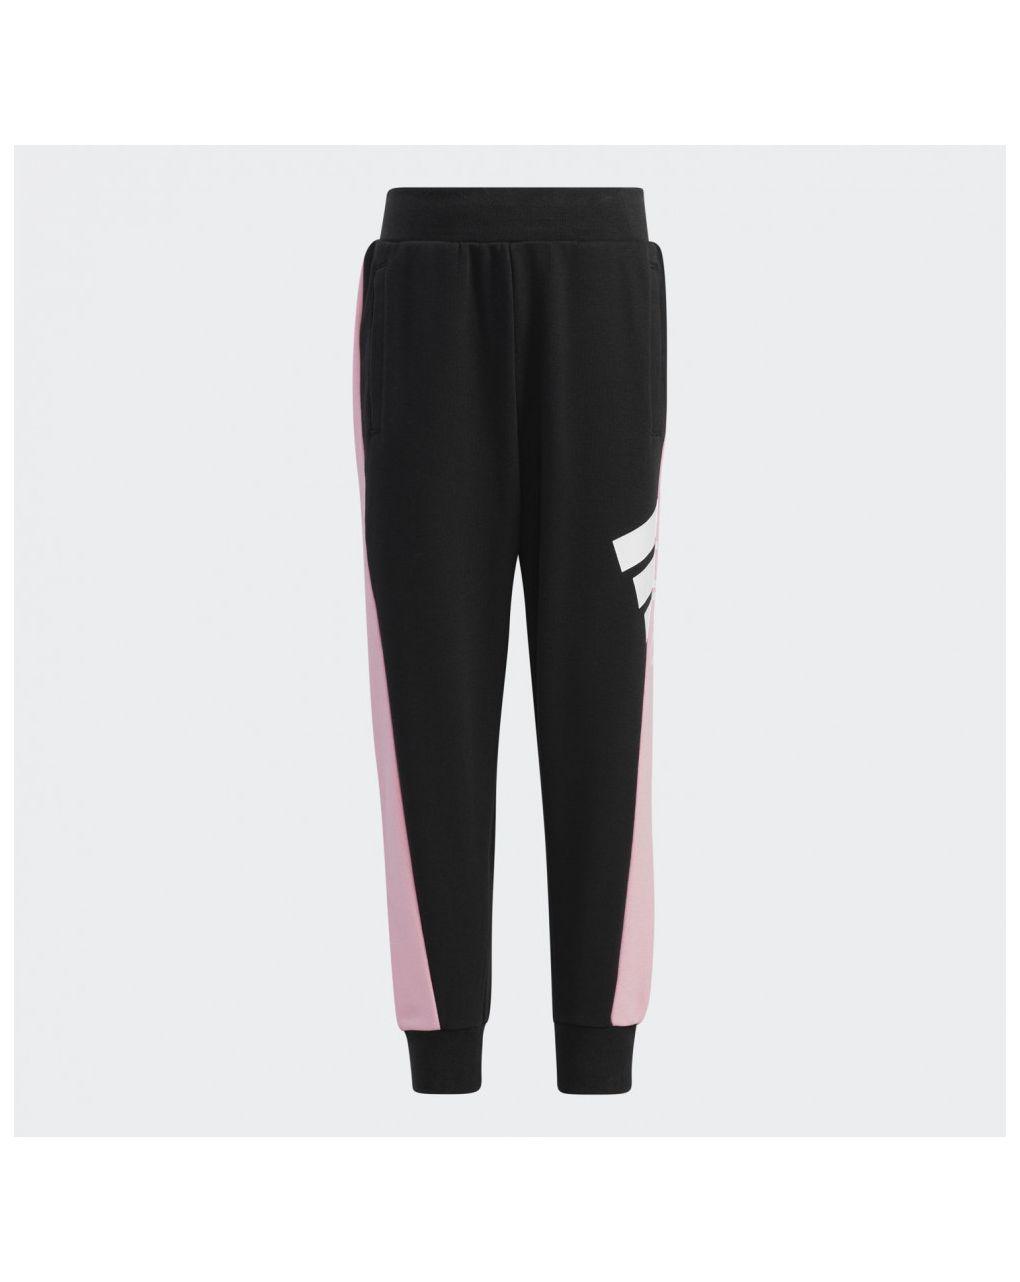 Adidas Παντελόνι Φόρμας Aeroready Badge of Sport Μαύρο για Κορίτσι H40261